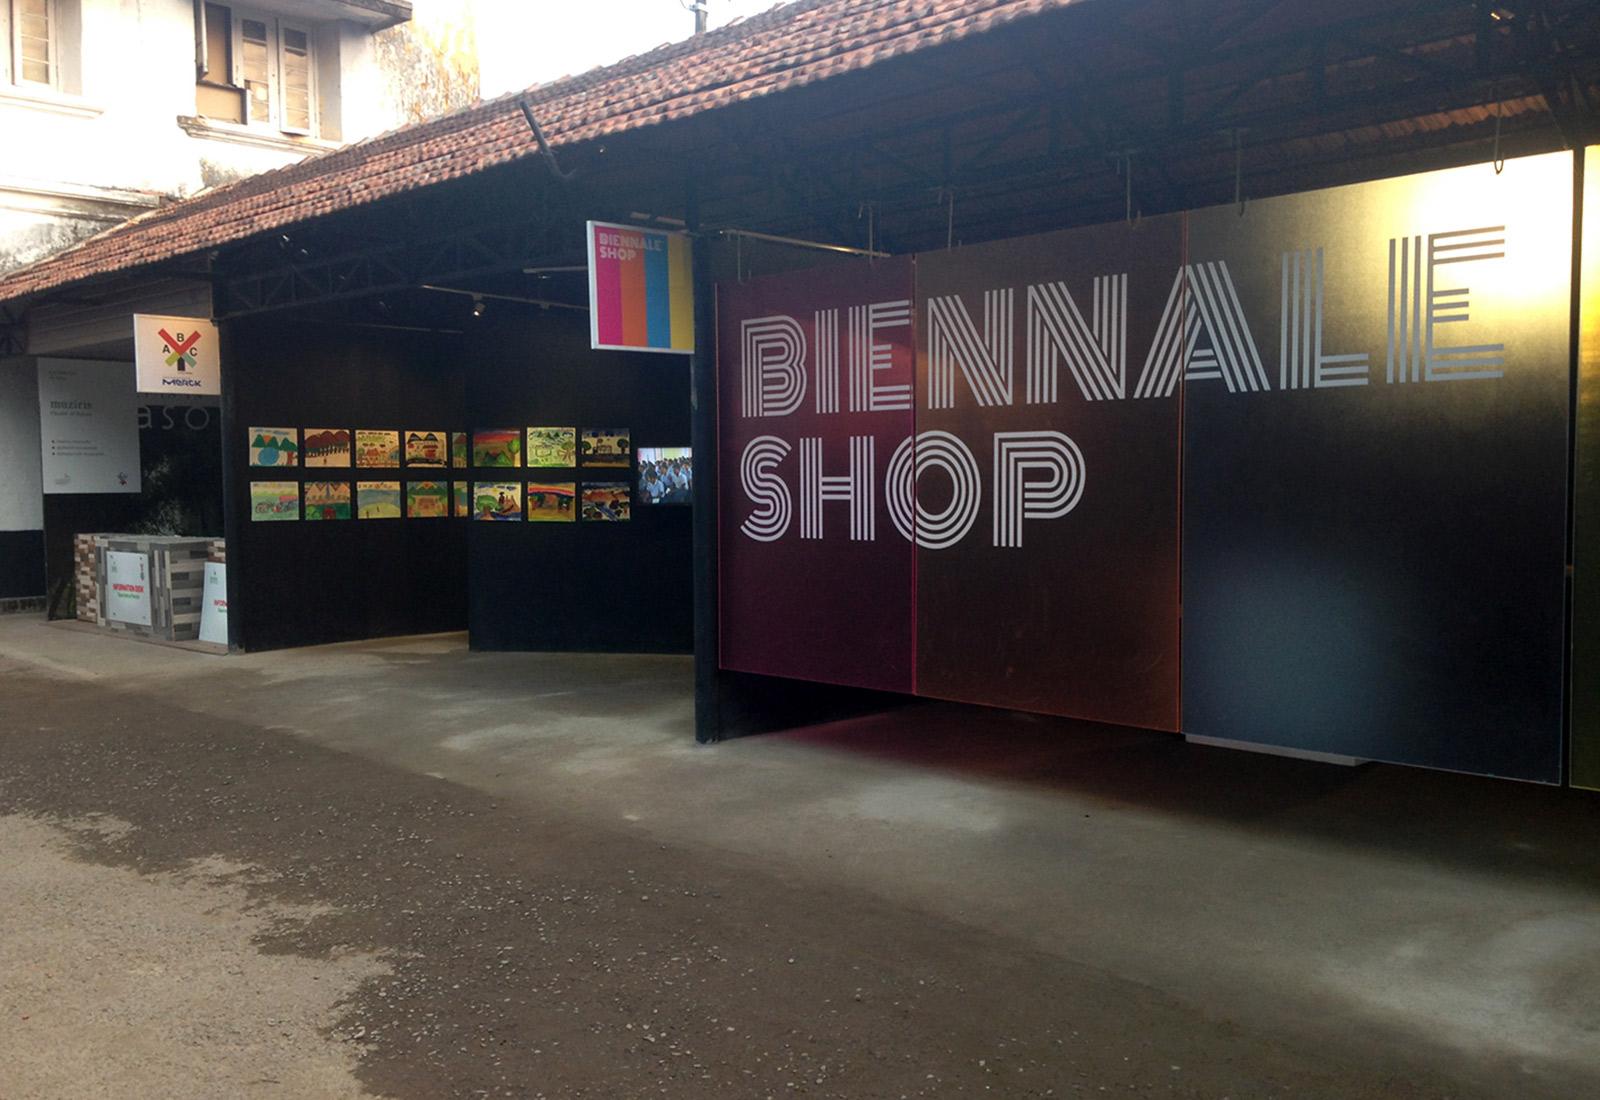 Biennale-shop